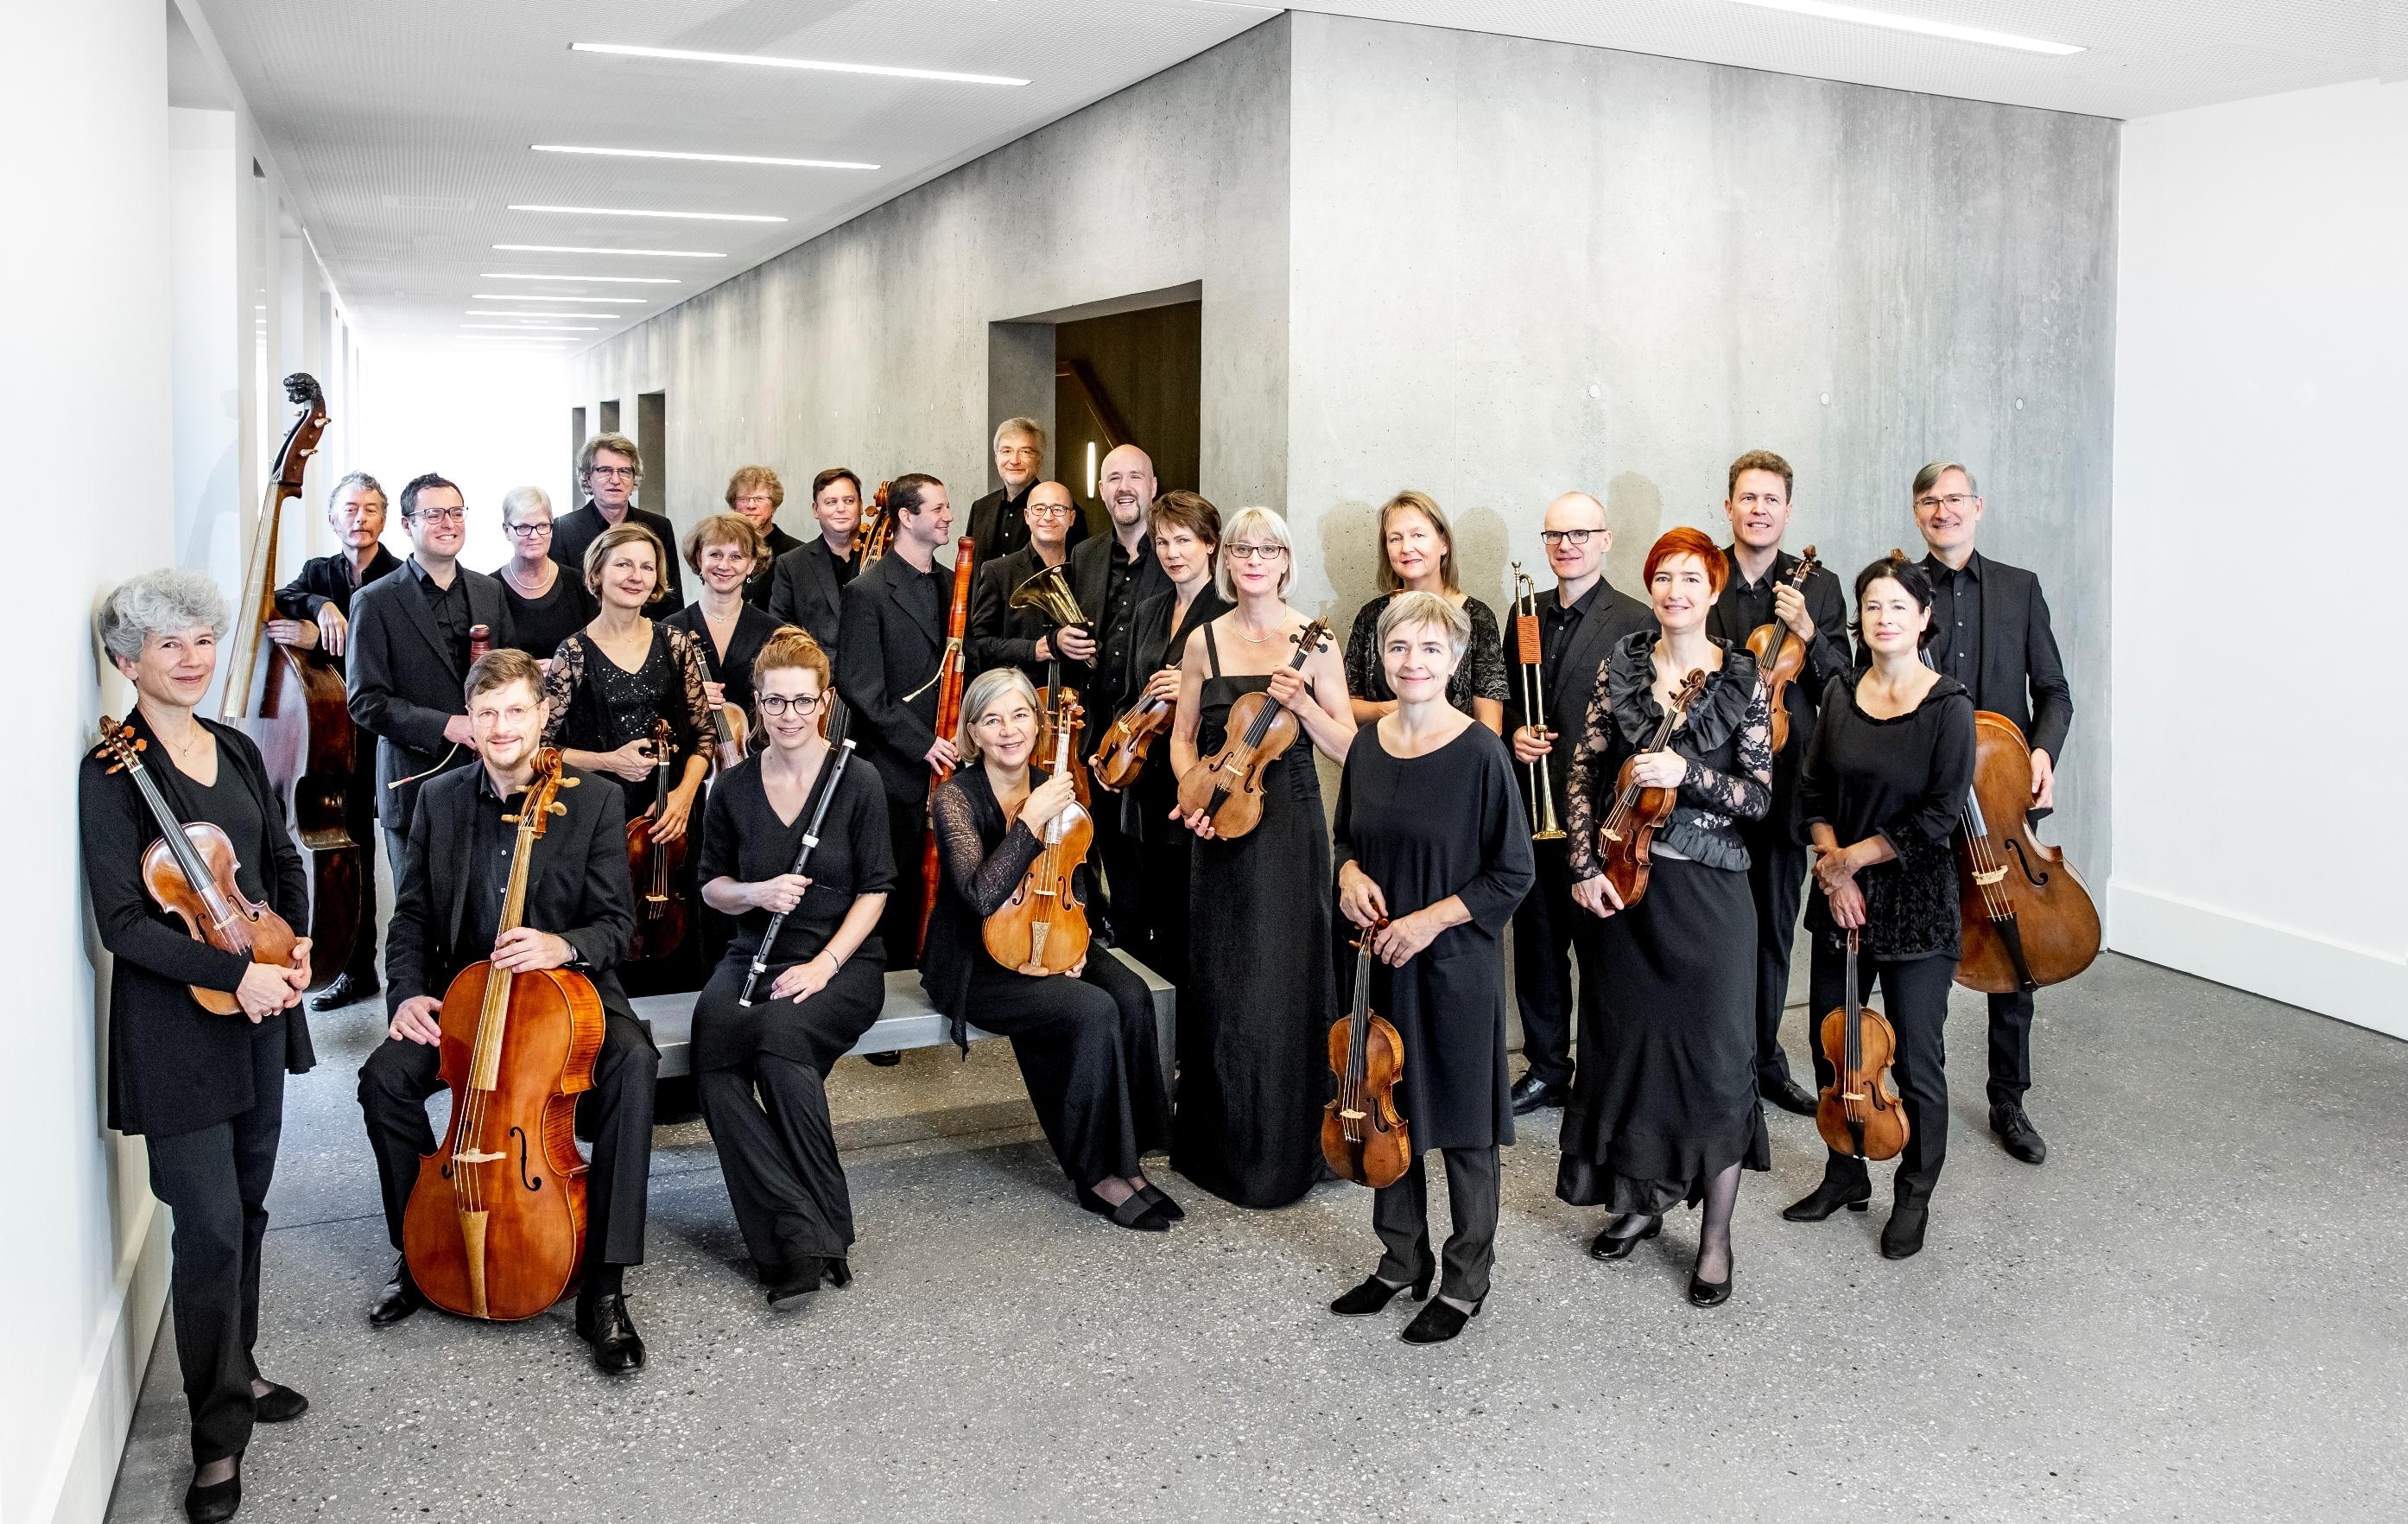 Freiburger Barockorchester